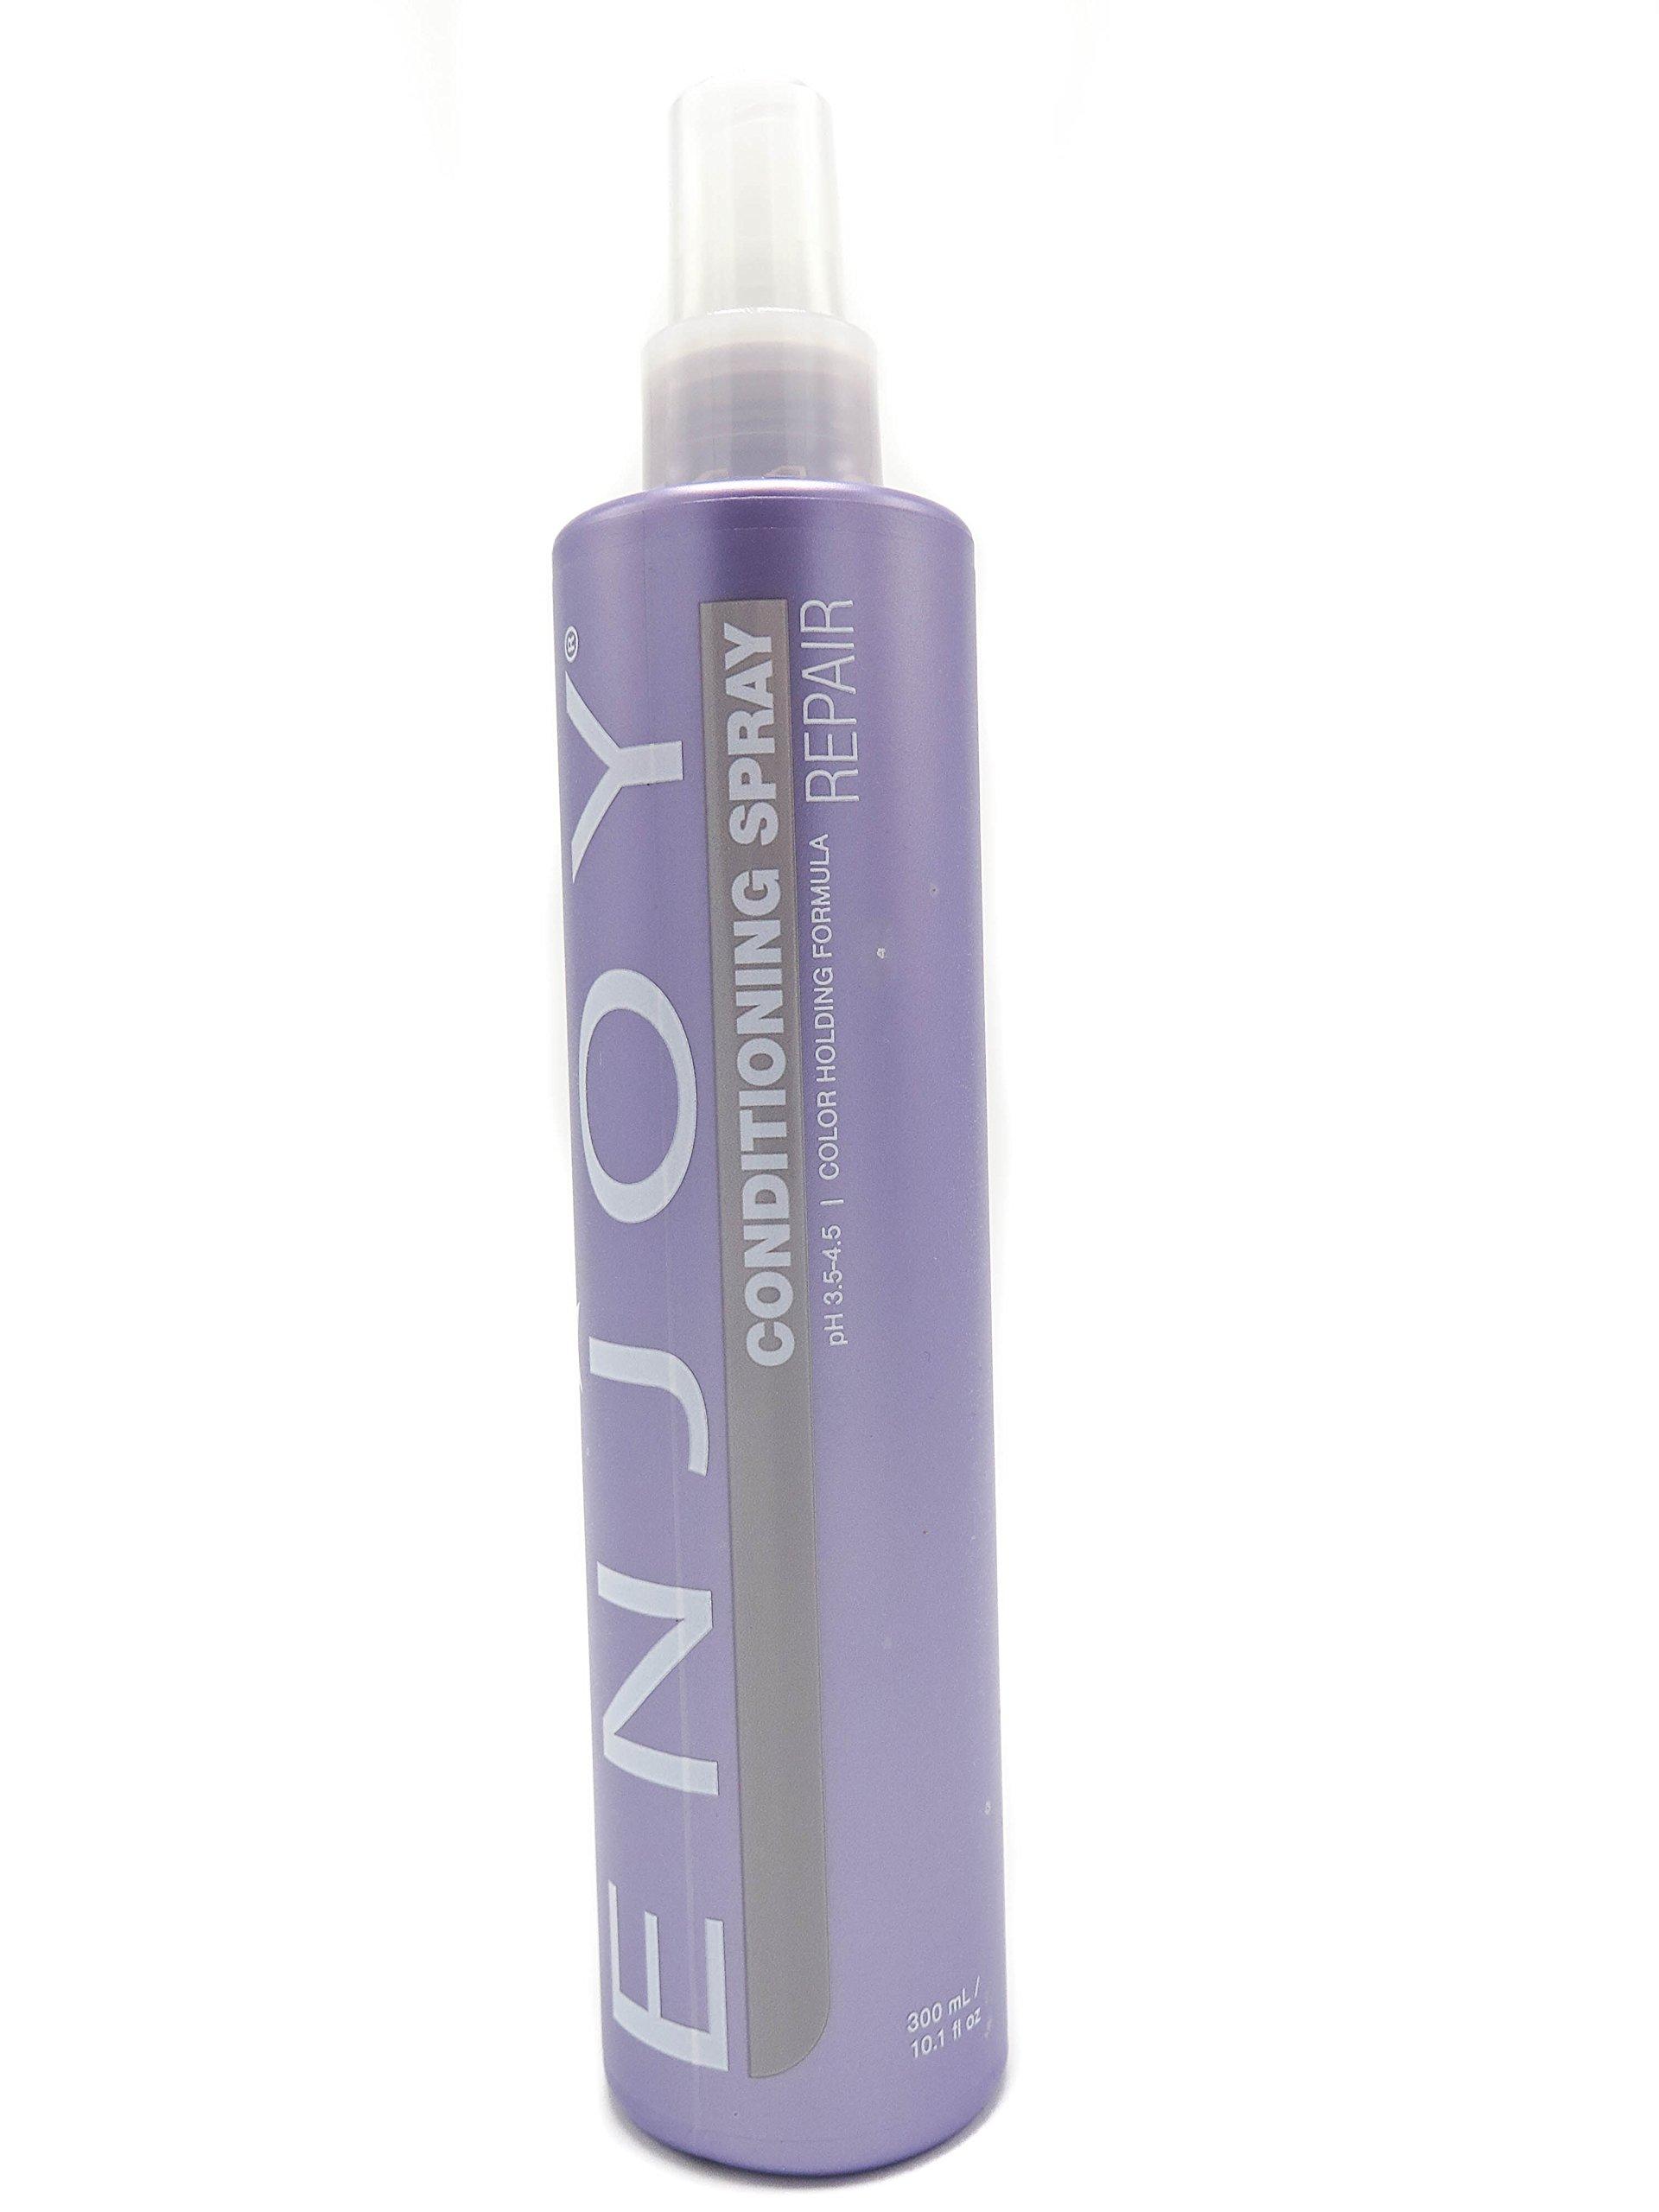 ENJOY Conditioning Spray (10.1 OZ) Moisture-Rich, Smoothing, Shine-Enhancing Conditioning Spray by Enjoy